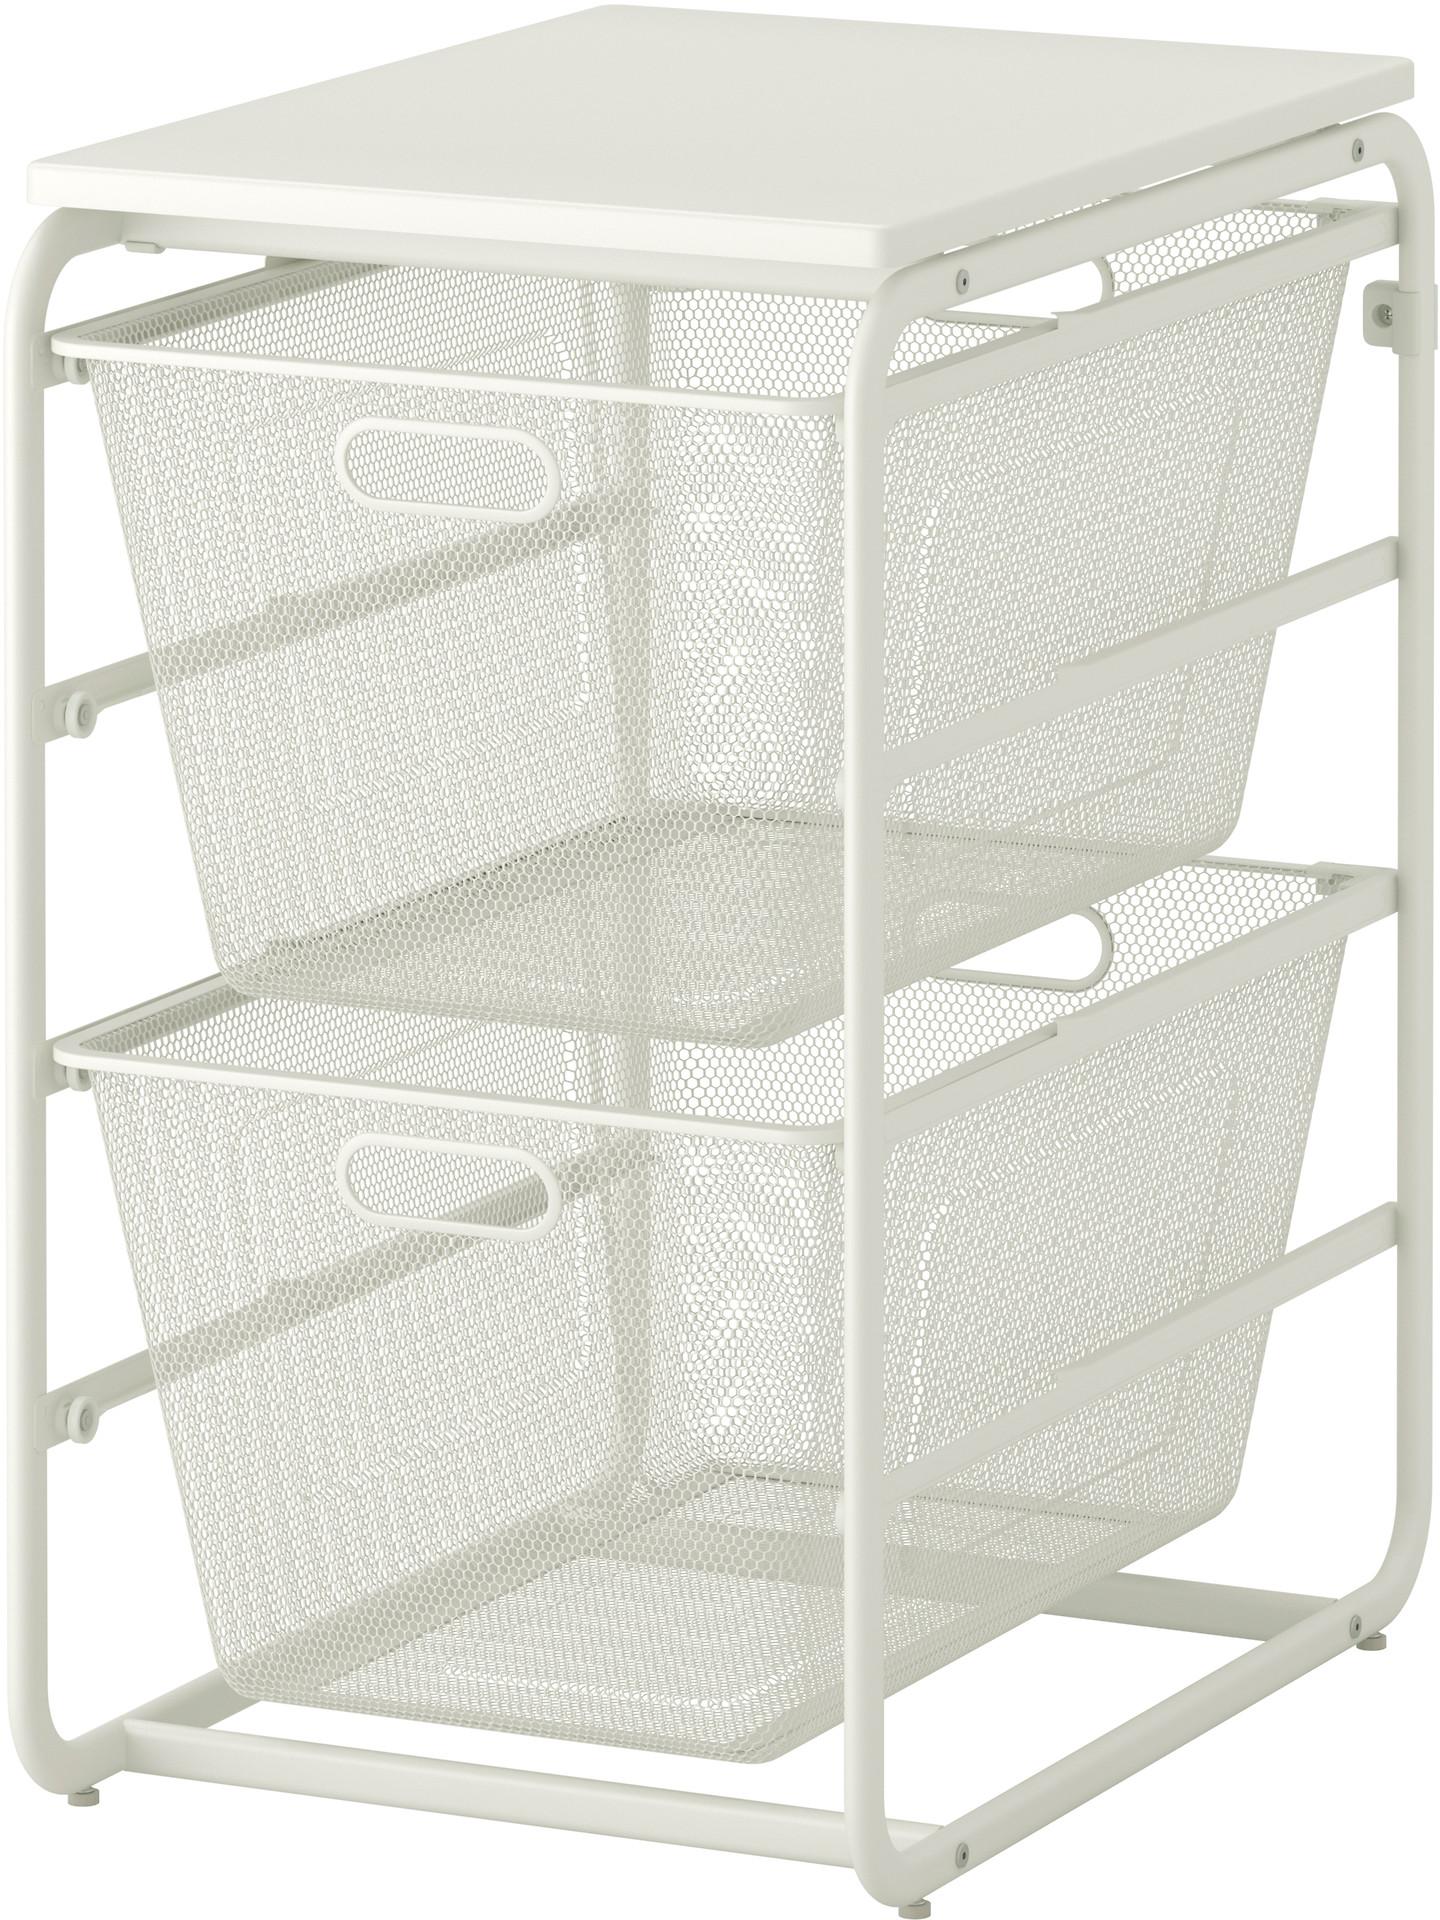 ALGOT Frame with 2 mesh baskets/top shelf - IKEA